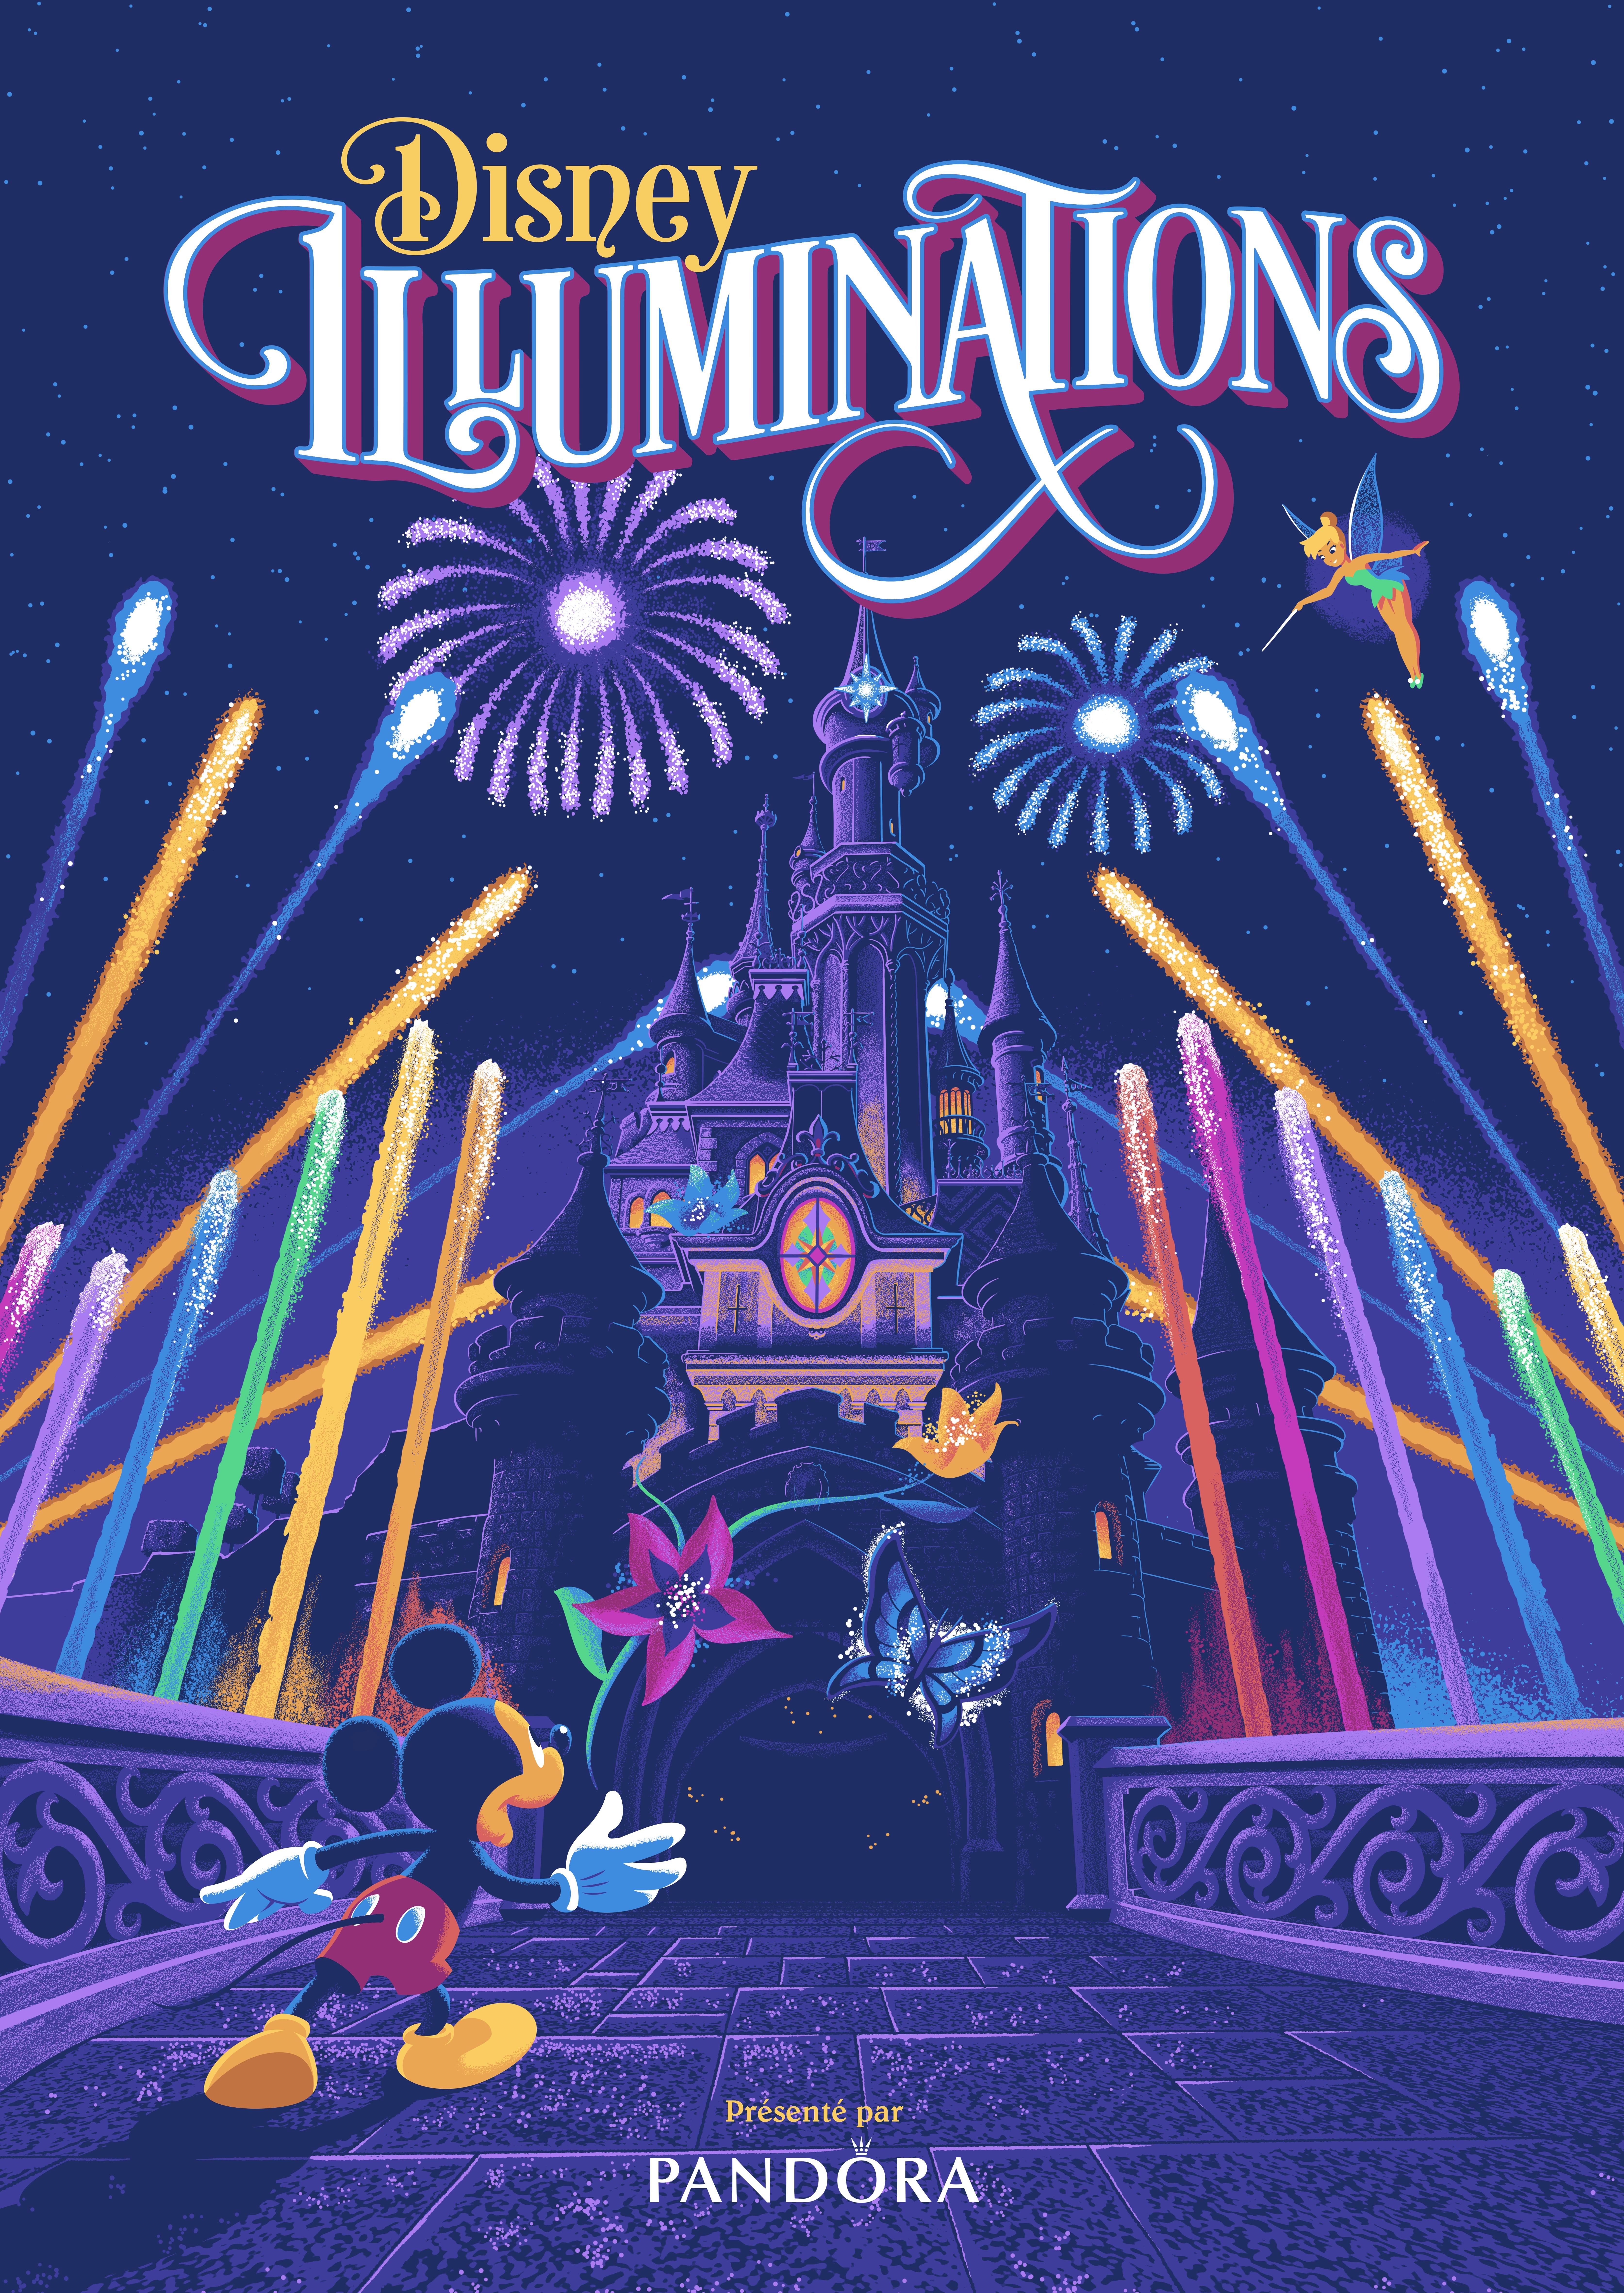 Pandora est le sponsor de Disney Illuminations à Disneyland Paris